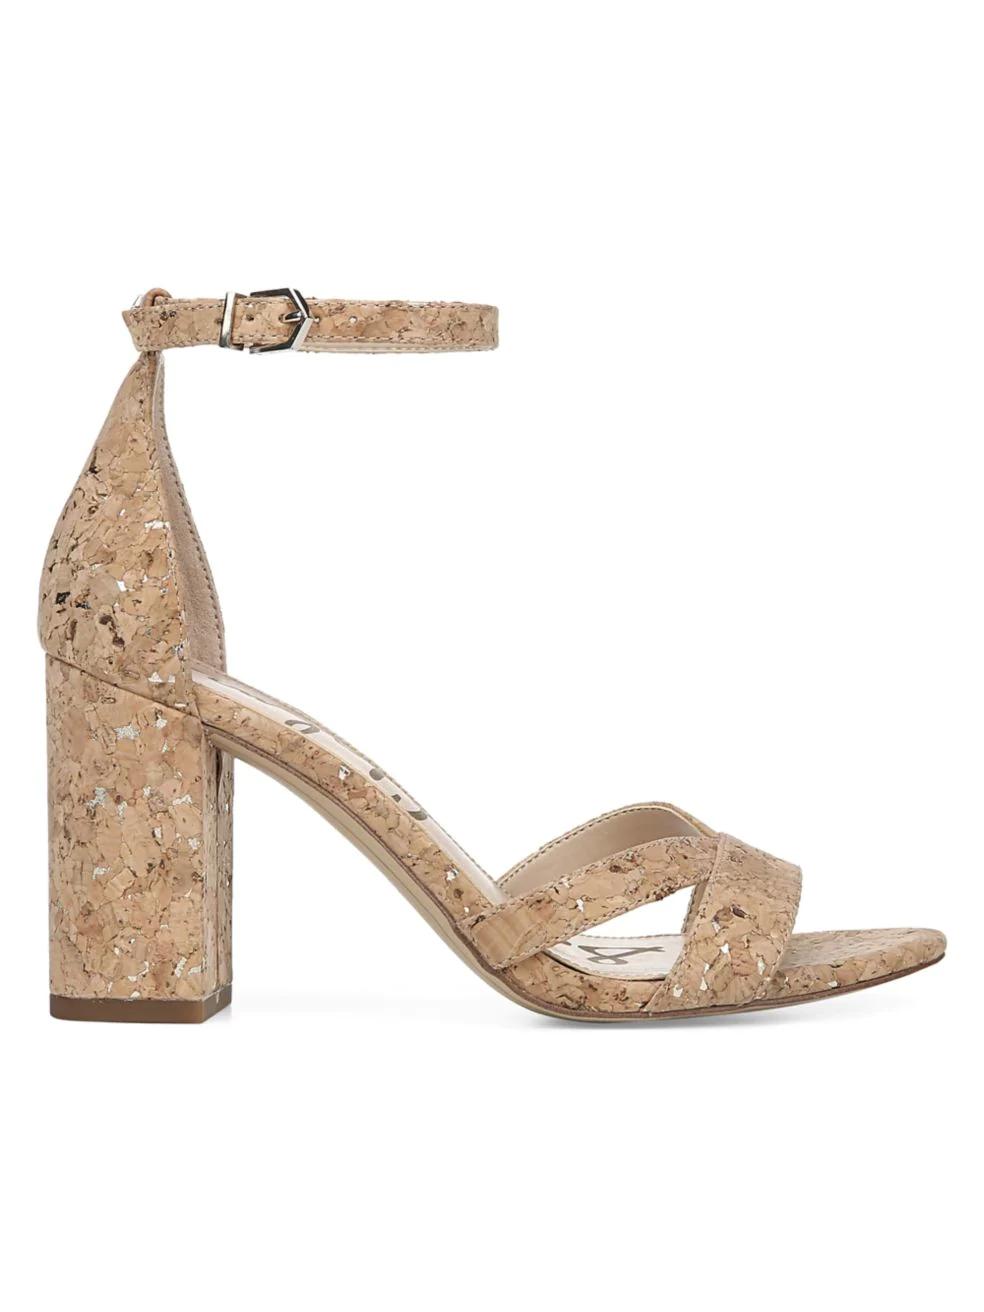 sam edelman. omar NEUTRAL cork heels sandals